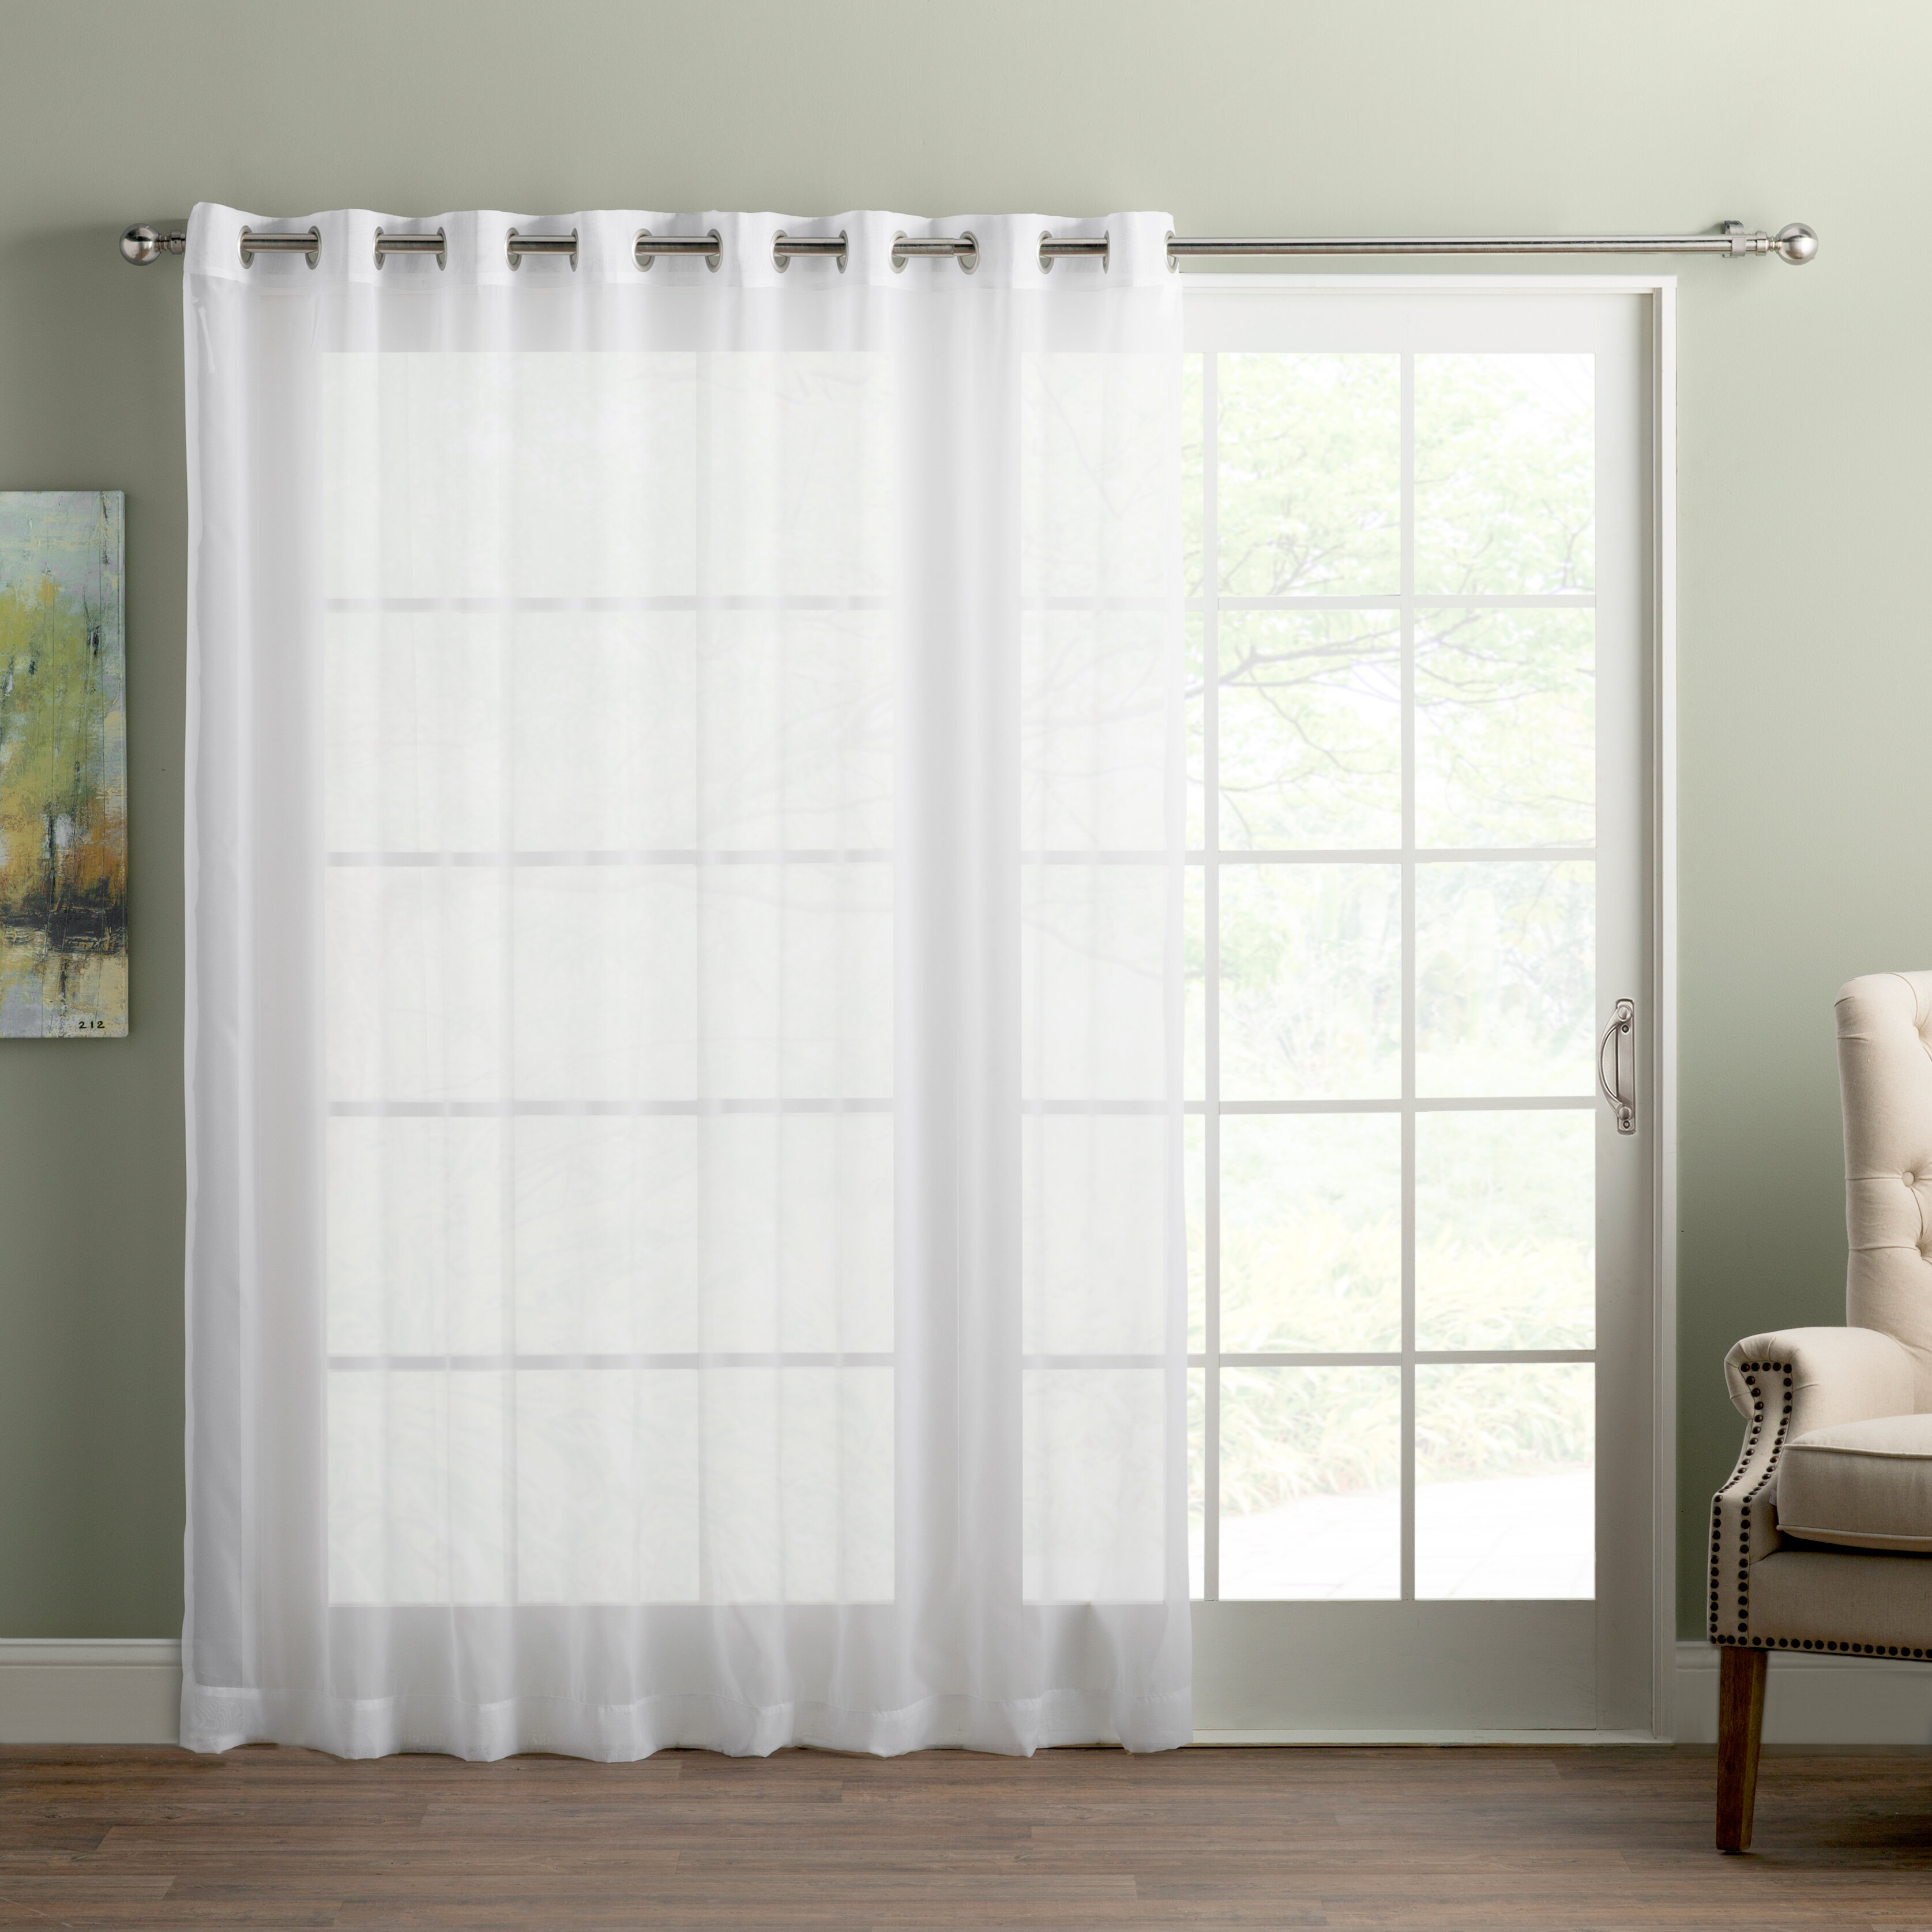 Wayfair Basics Sliding Door Patio Solid Sheer Grommet Single Curtain Panel